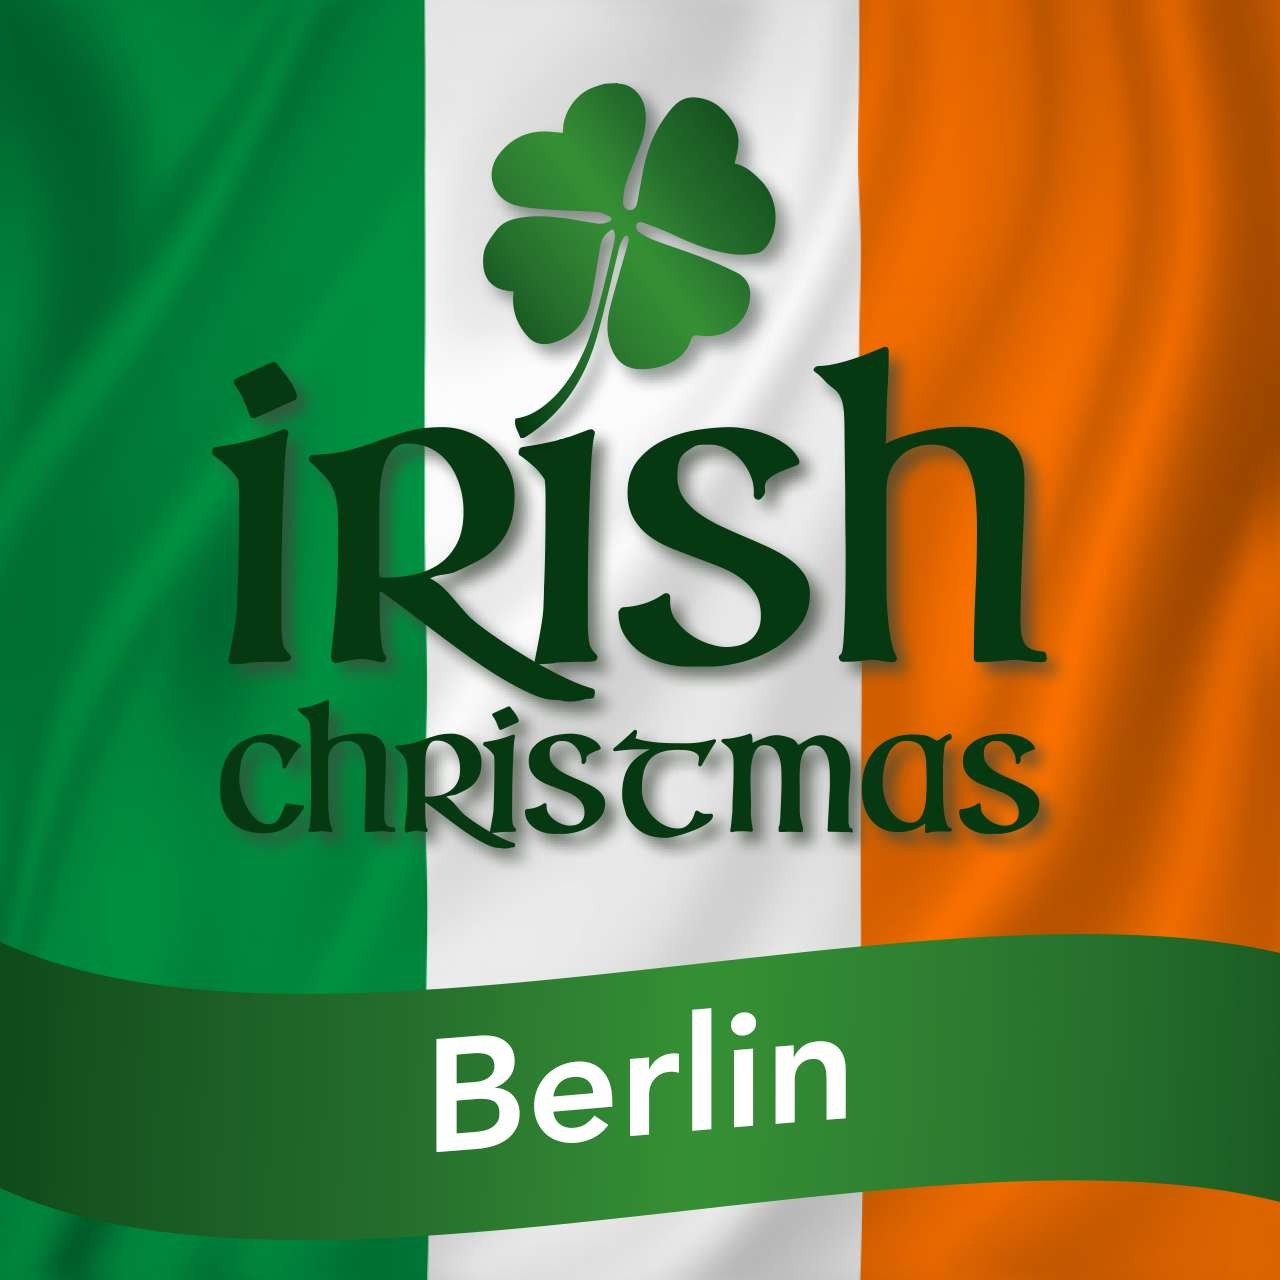 Irish Christmas Berlin